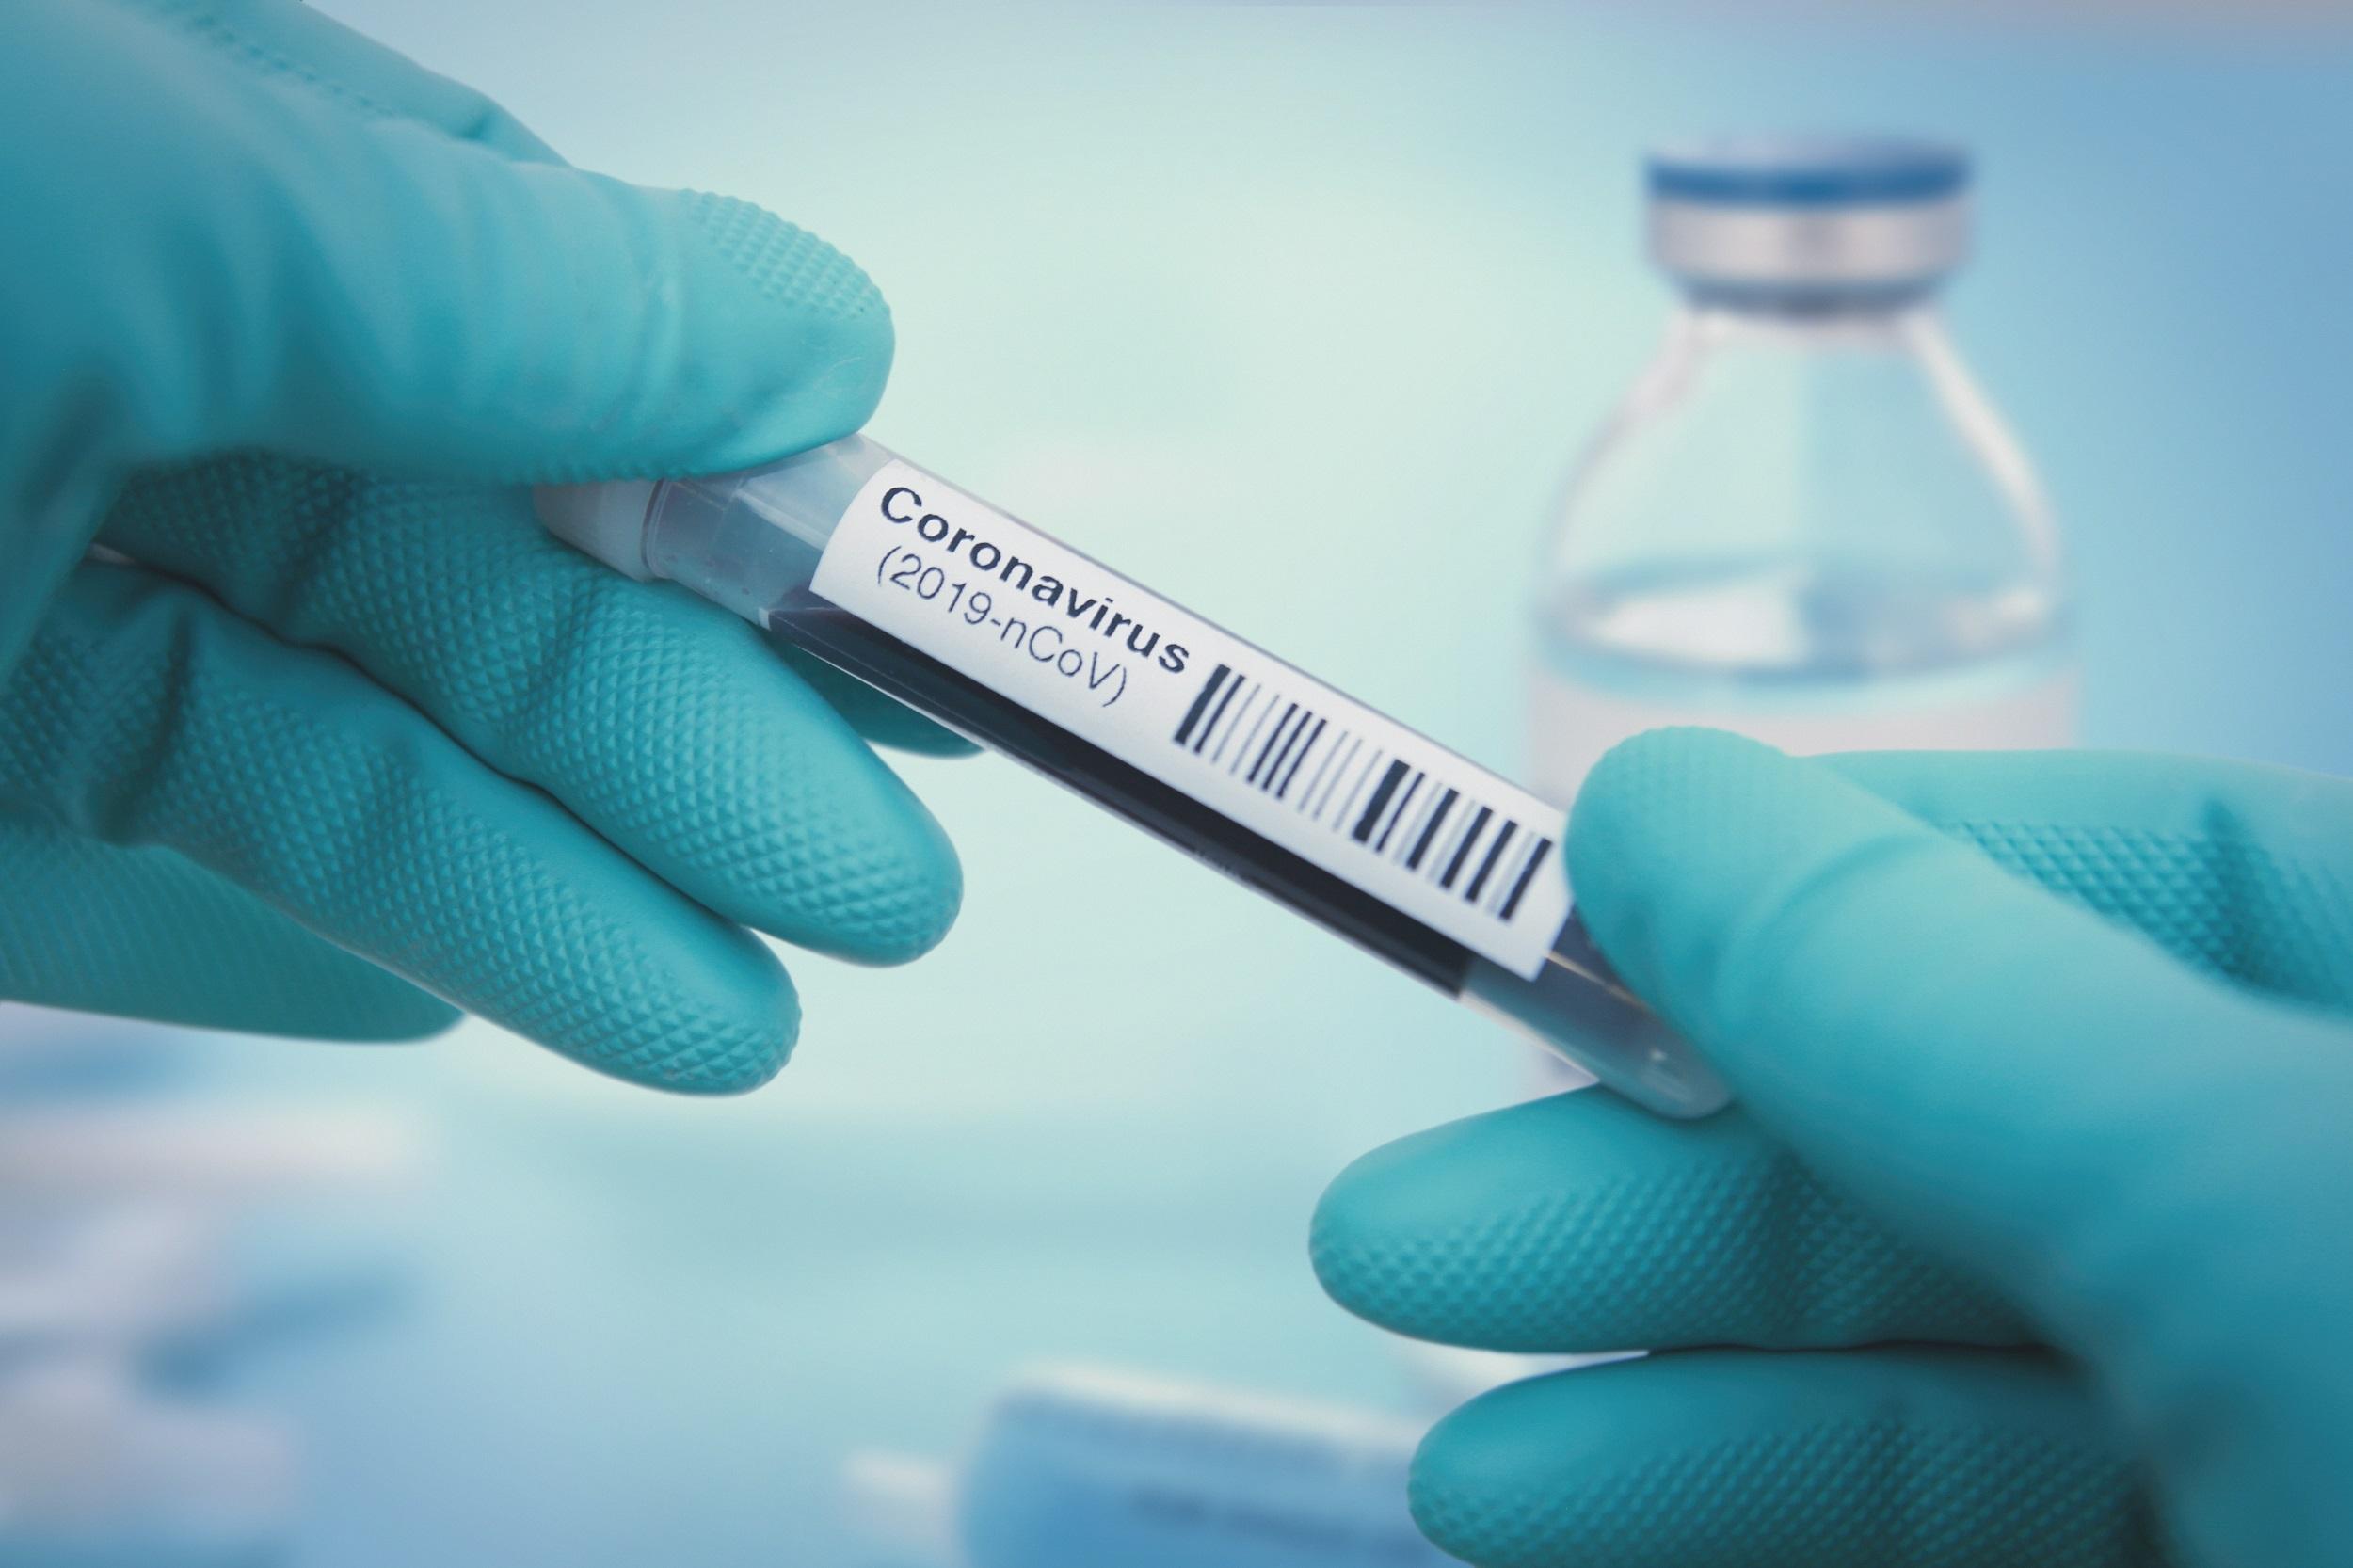 Informationen Zum Coronavirus Stadt Chemnitz